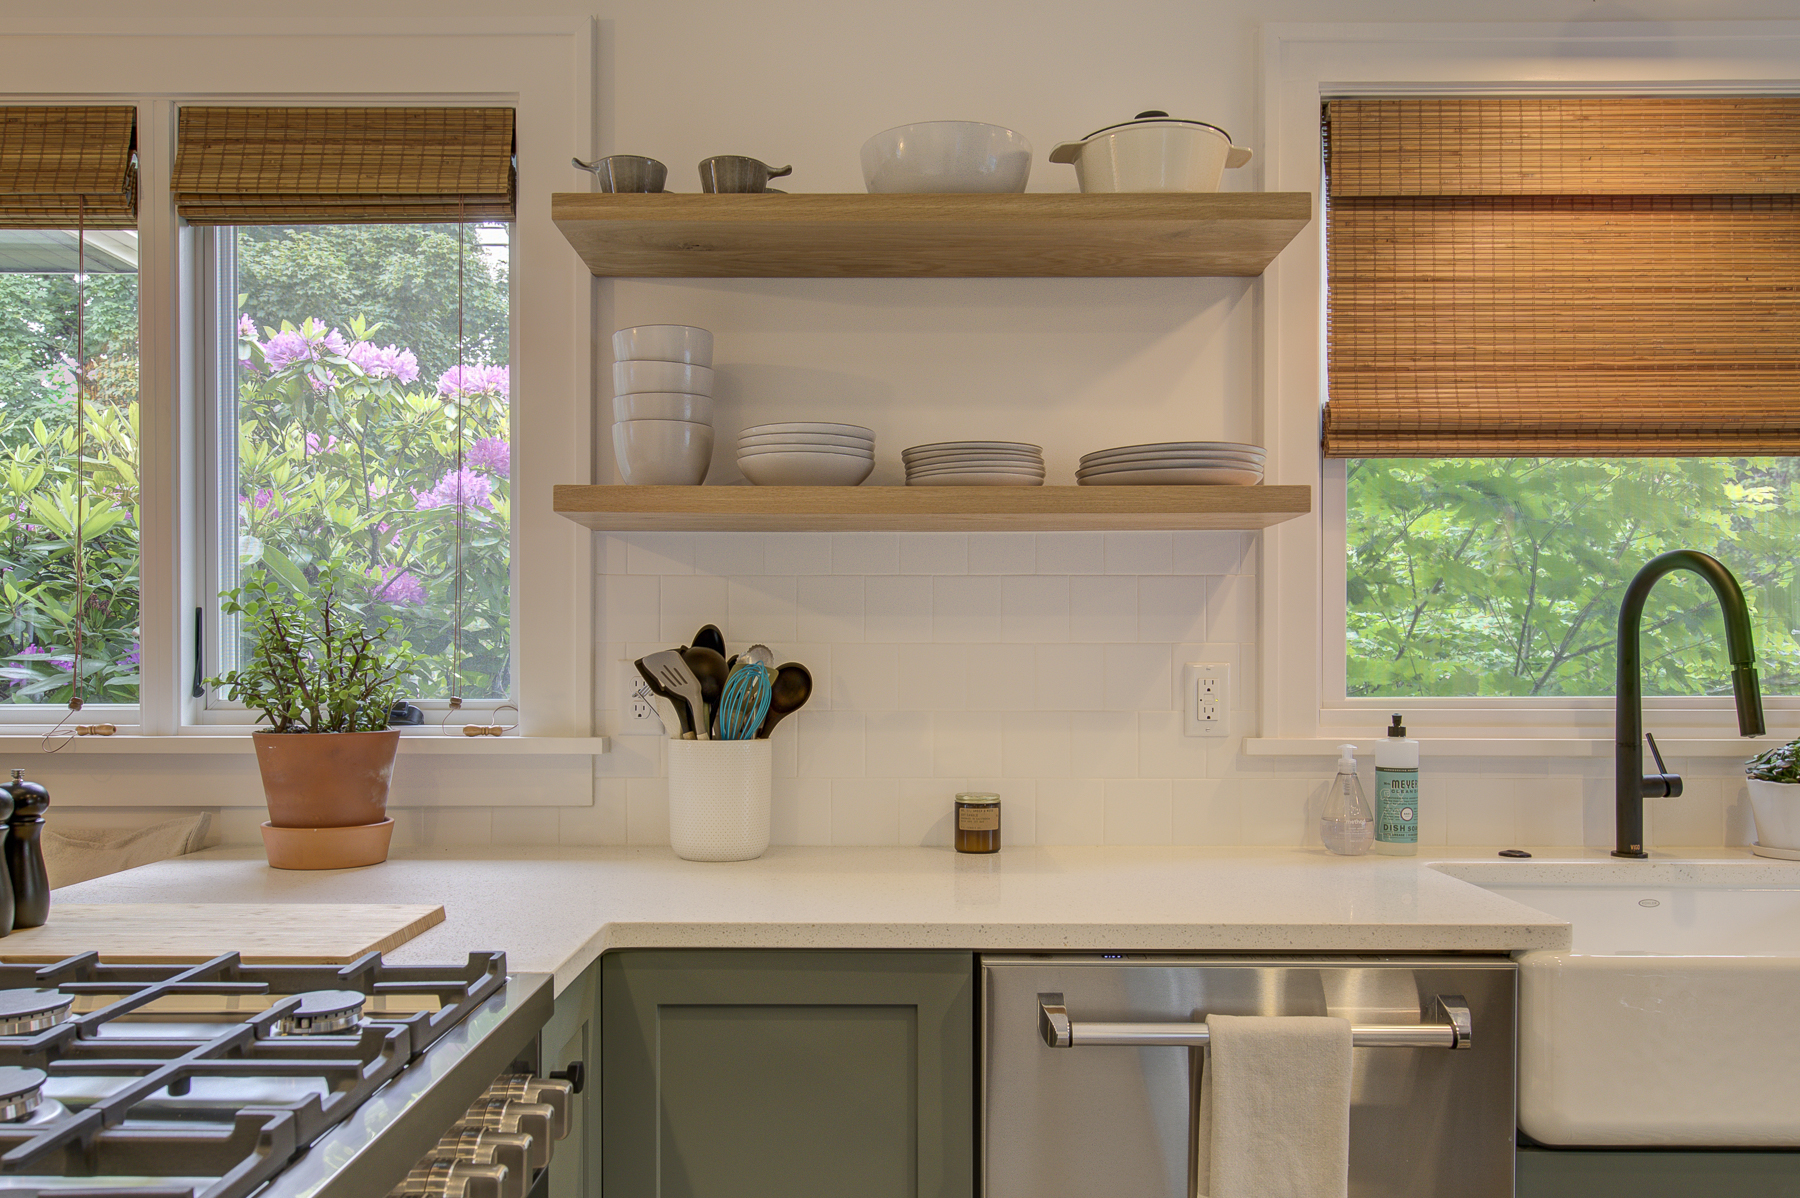 Harka Architecture Rose City Park Kitchen Shelves